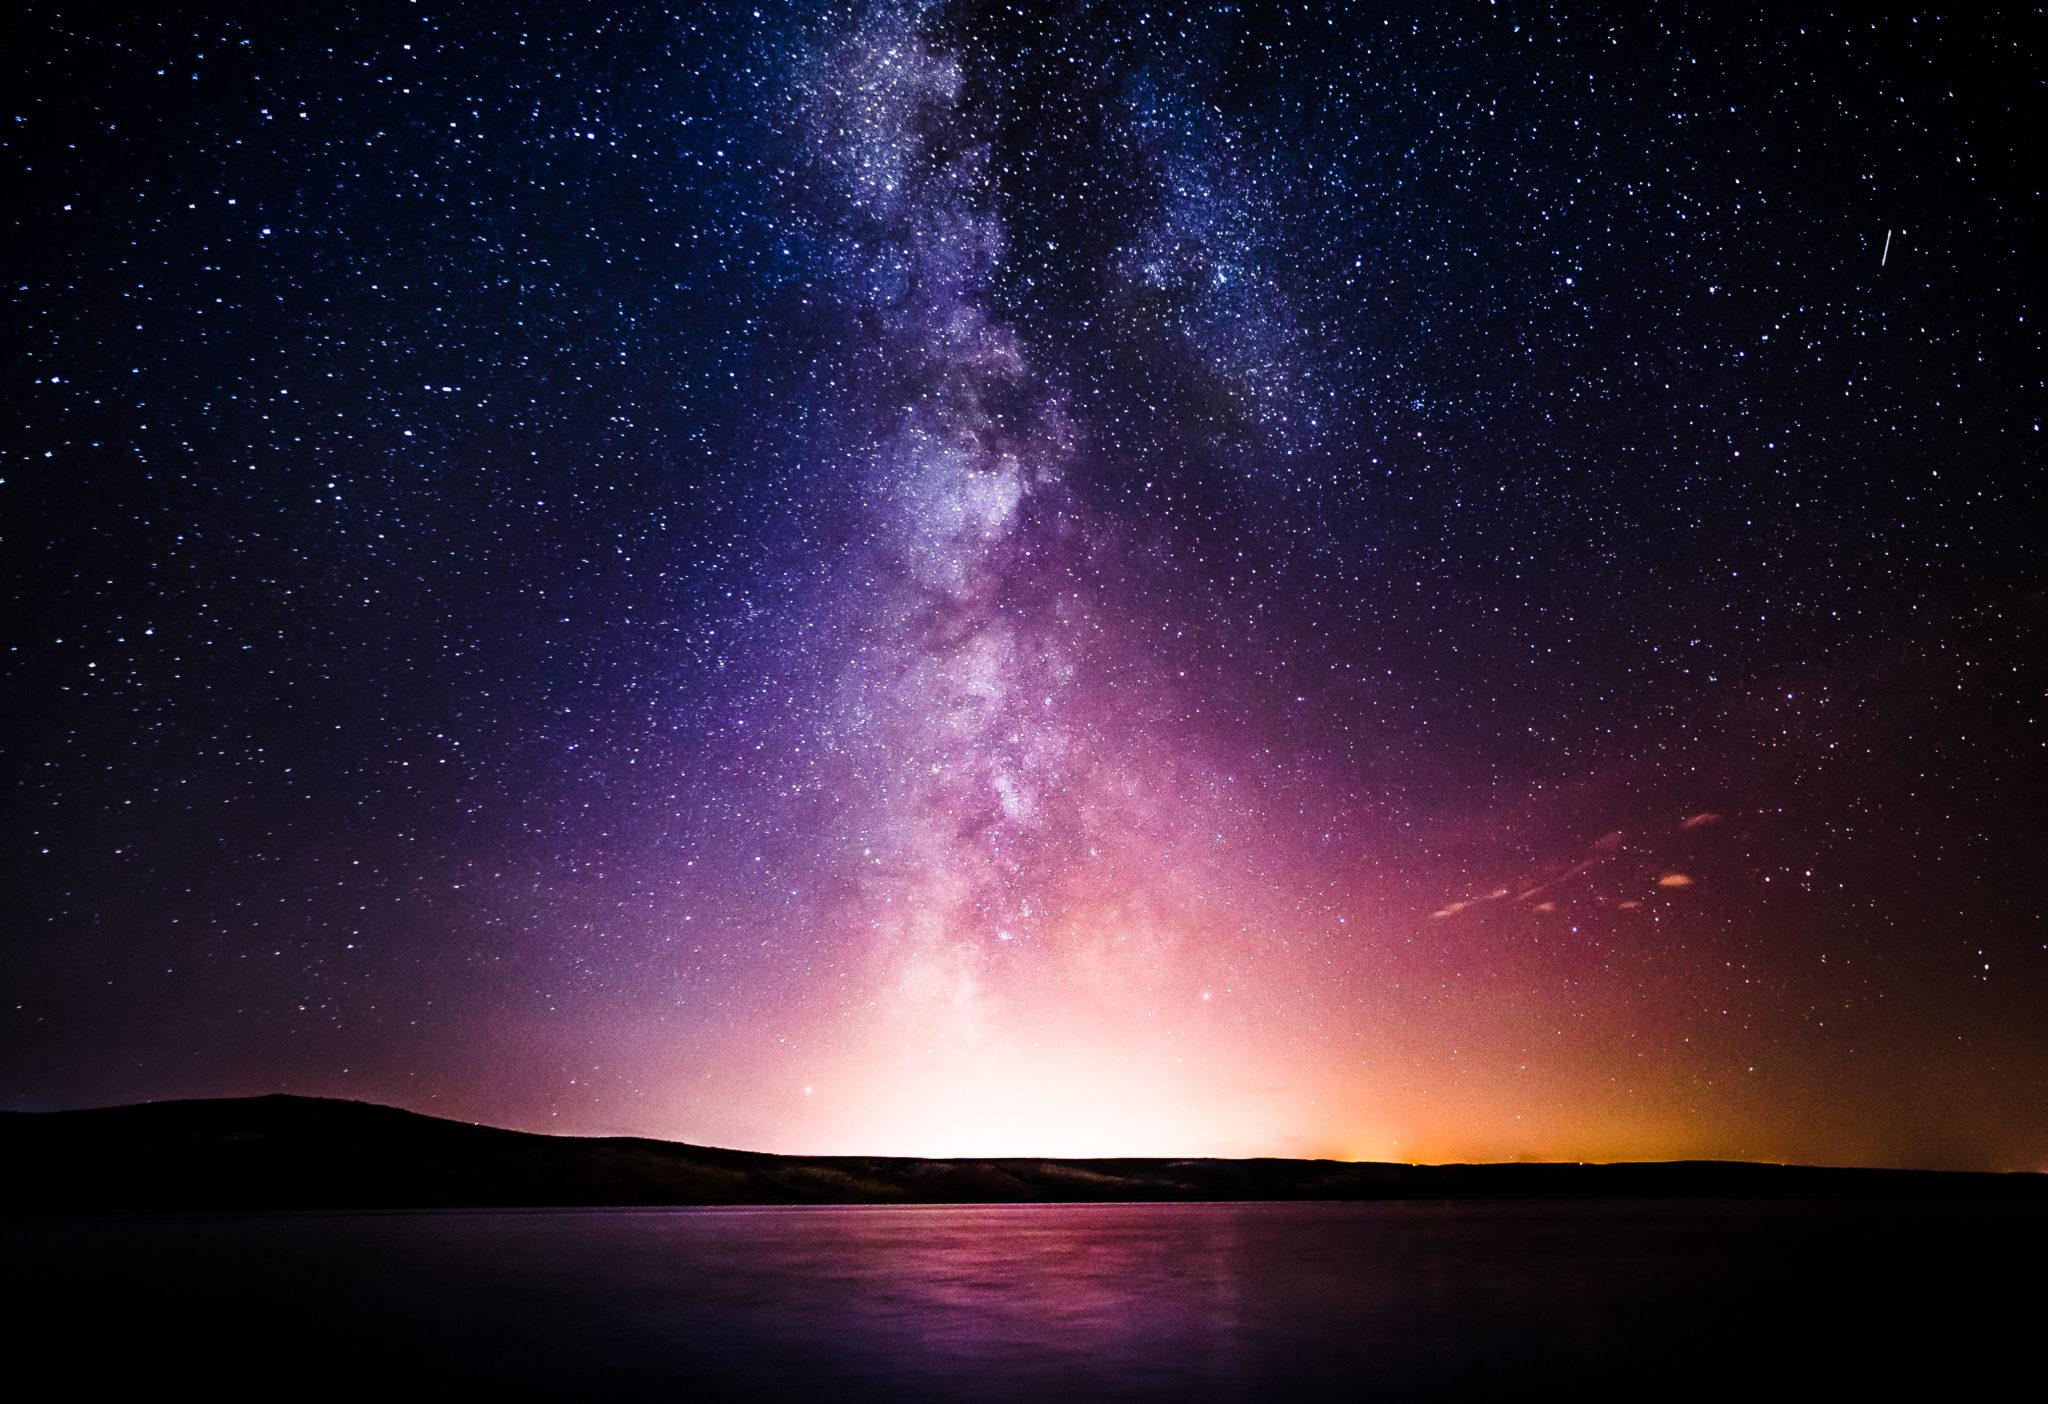 Milky,Way,Over,The,Sea